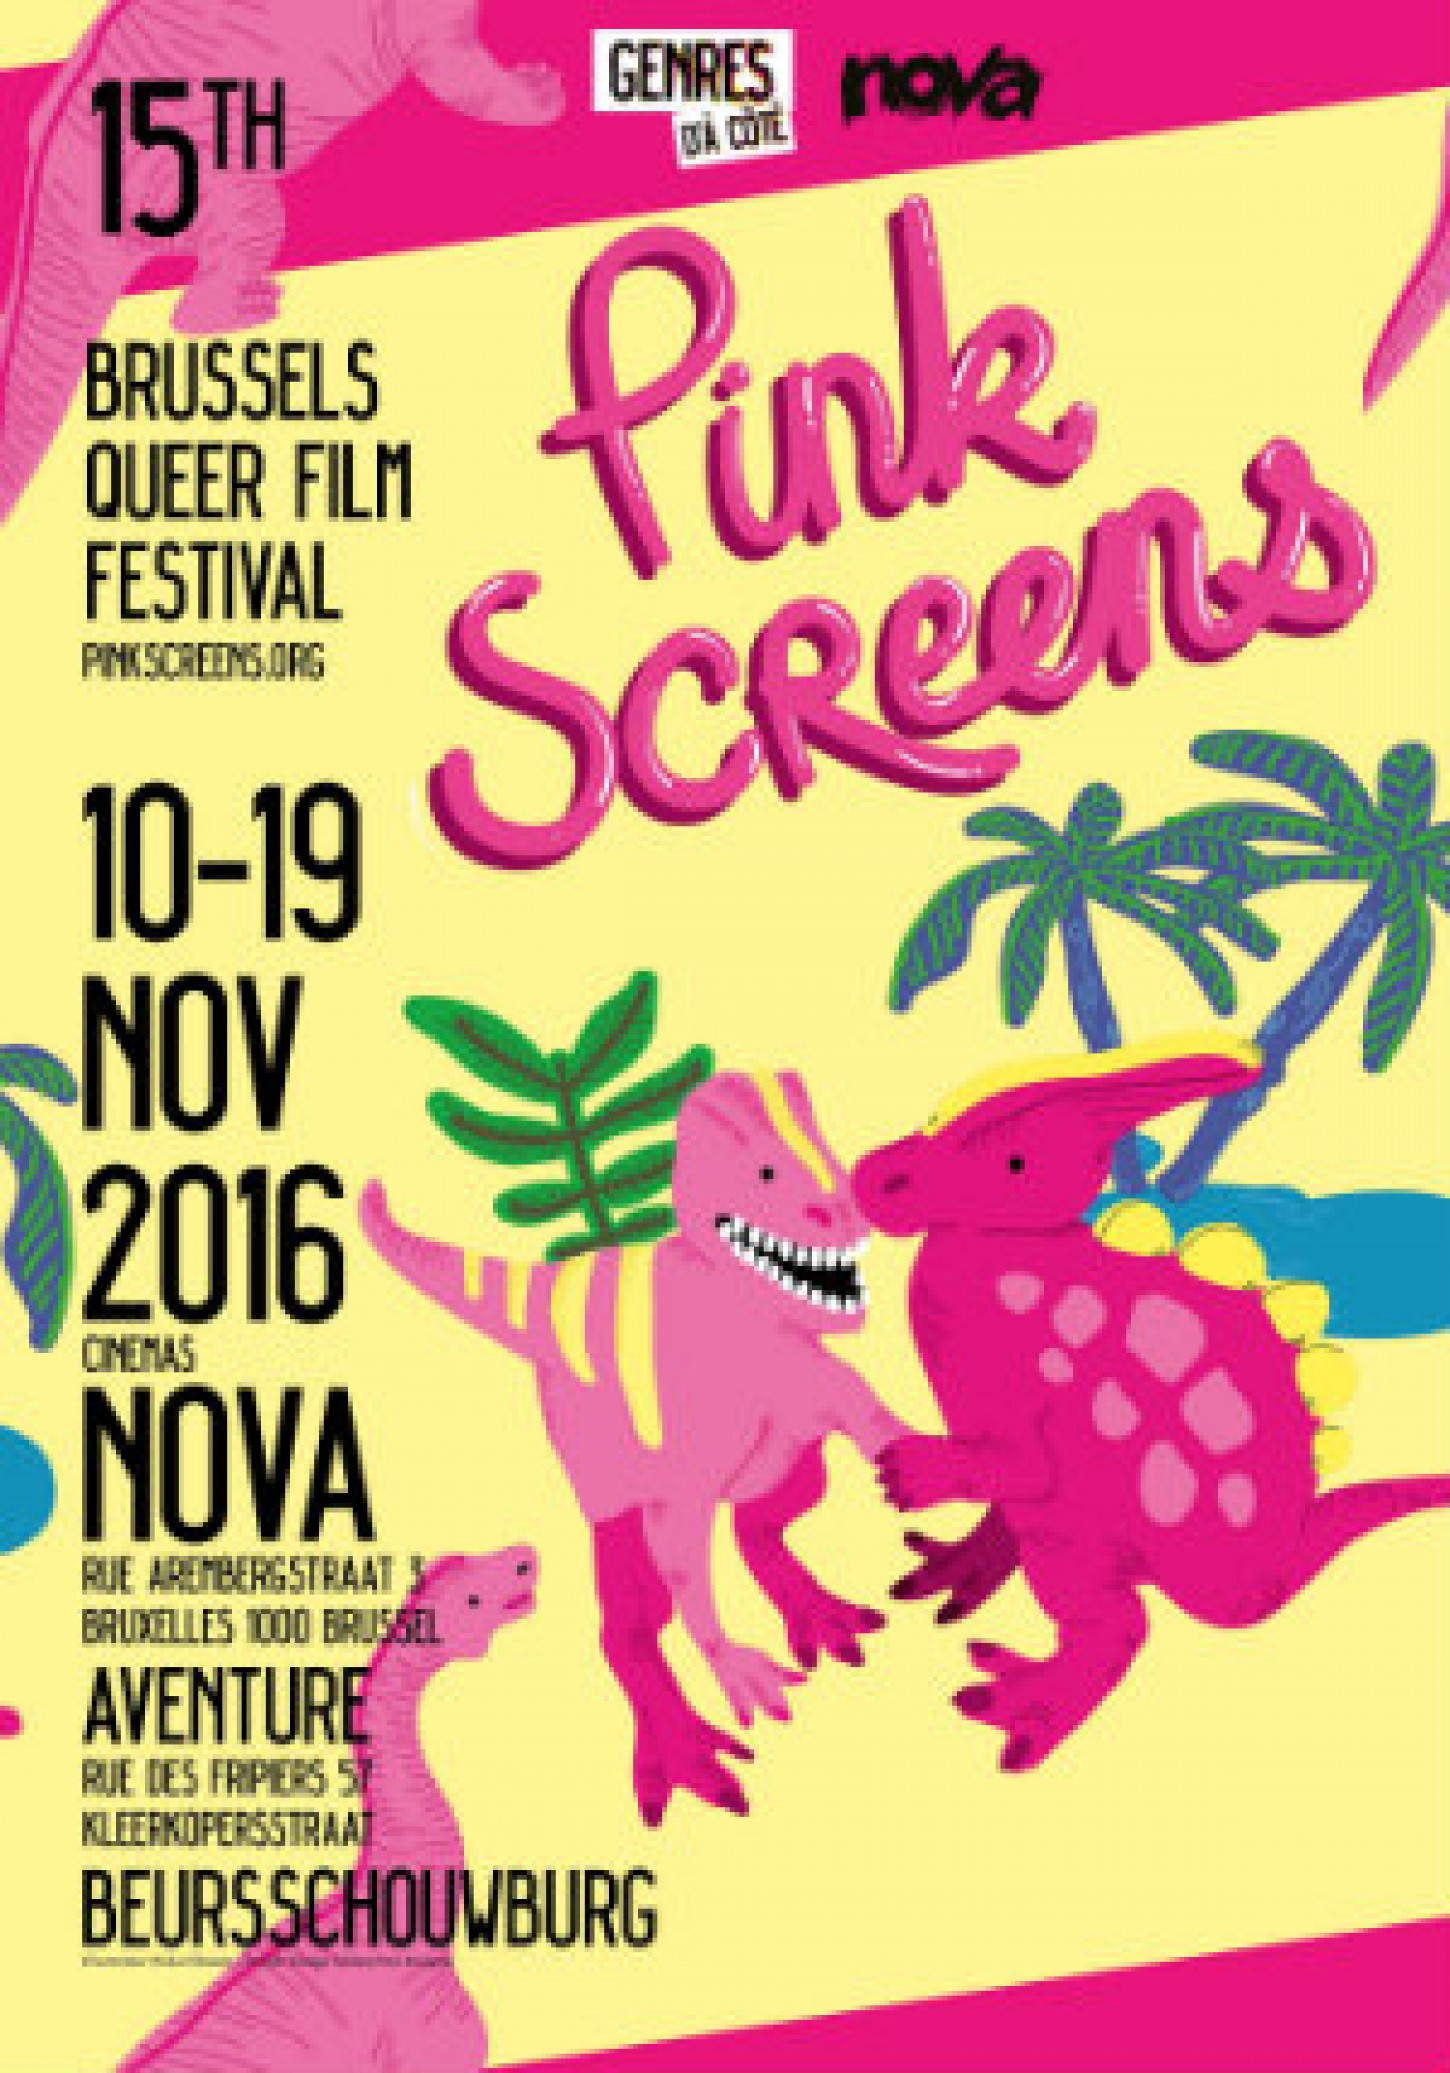 Brussels queer film festival 2016